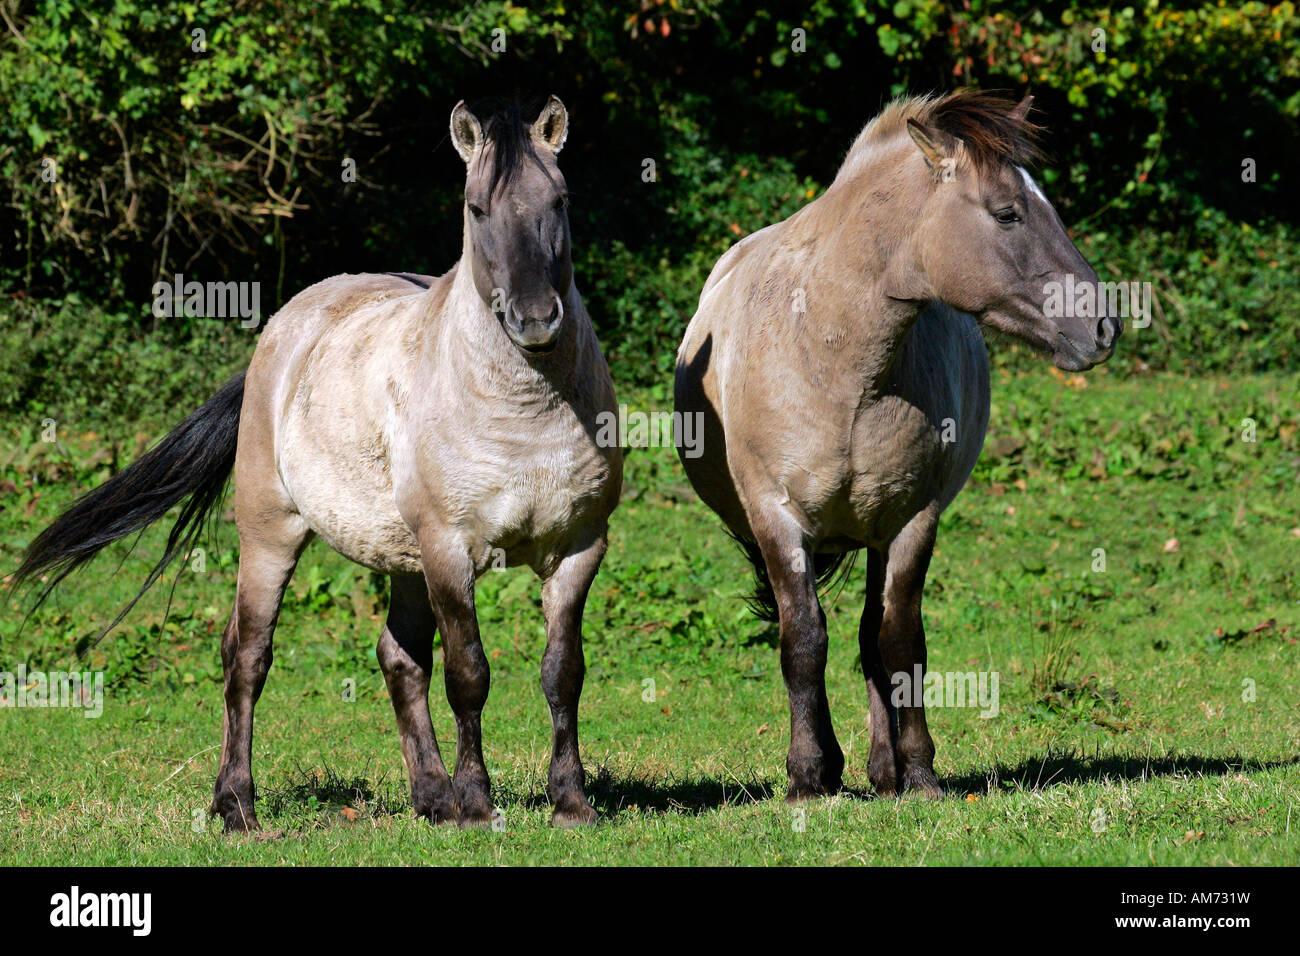 Konik horses - koniks (Equus przewalskii f. caballus) Stock Photo